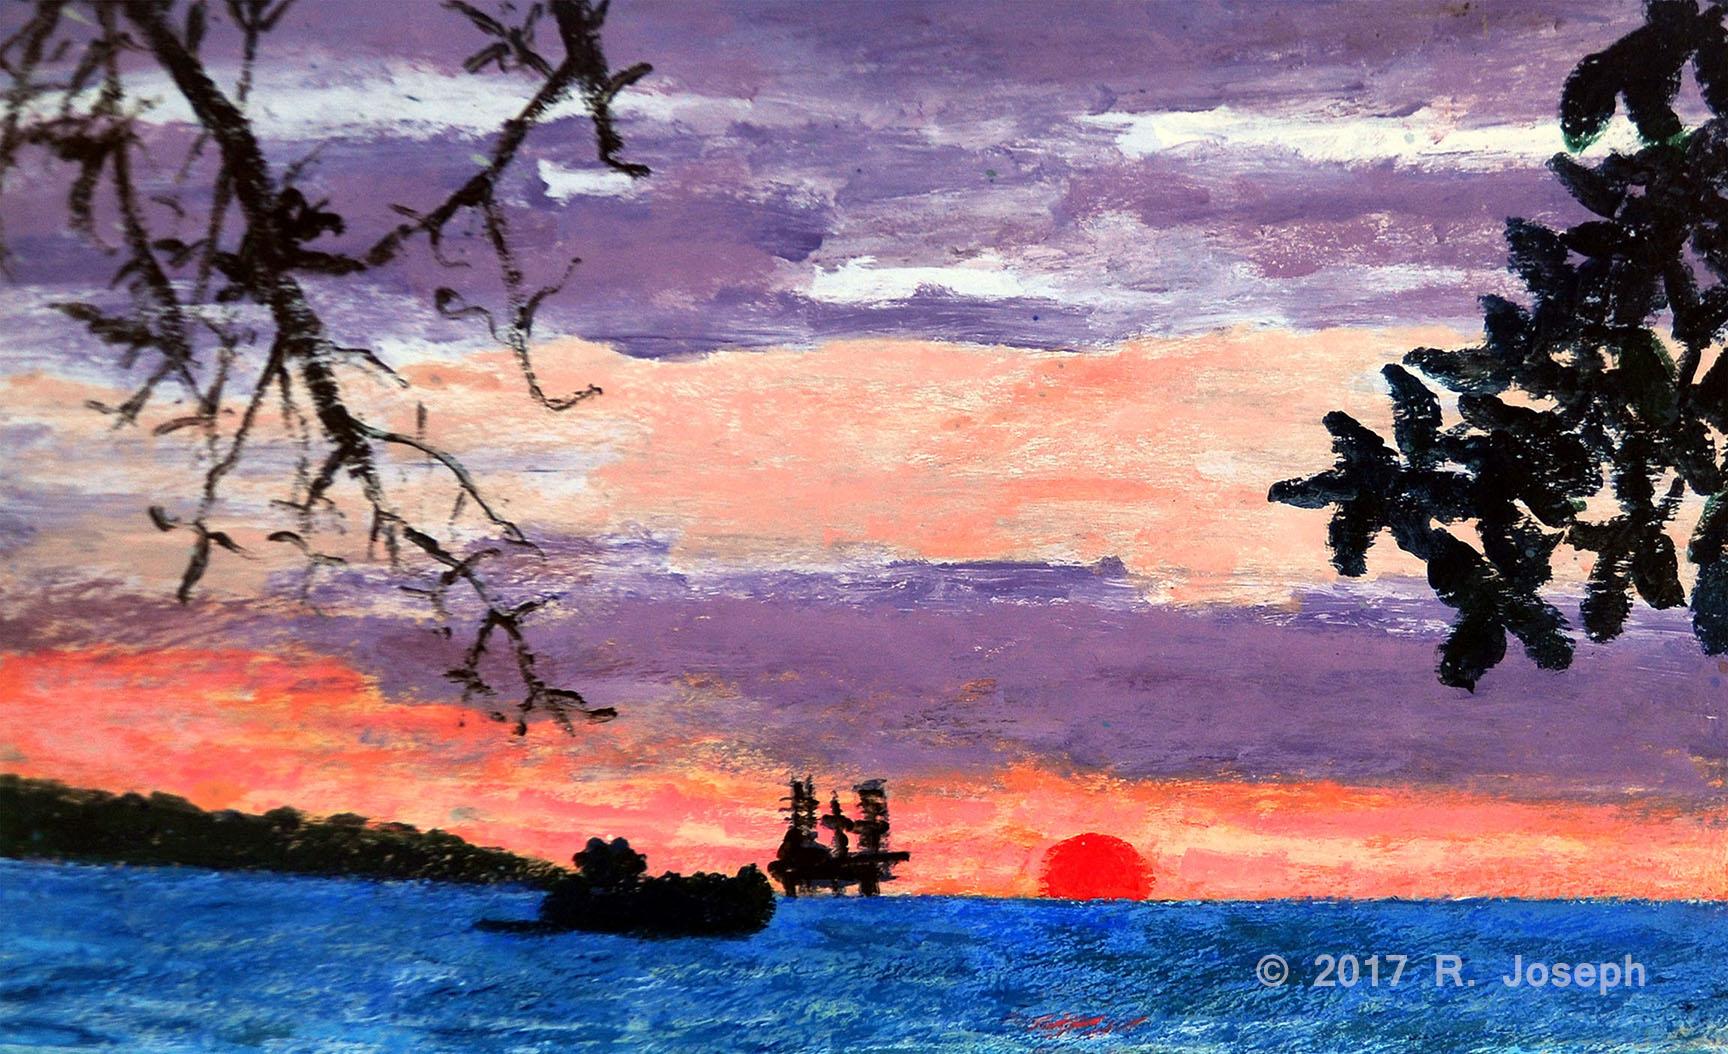 Faralon Rock at Sunset